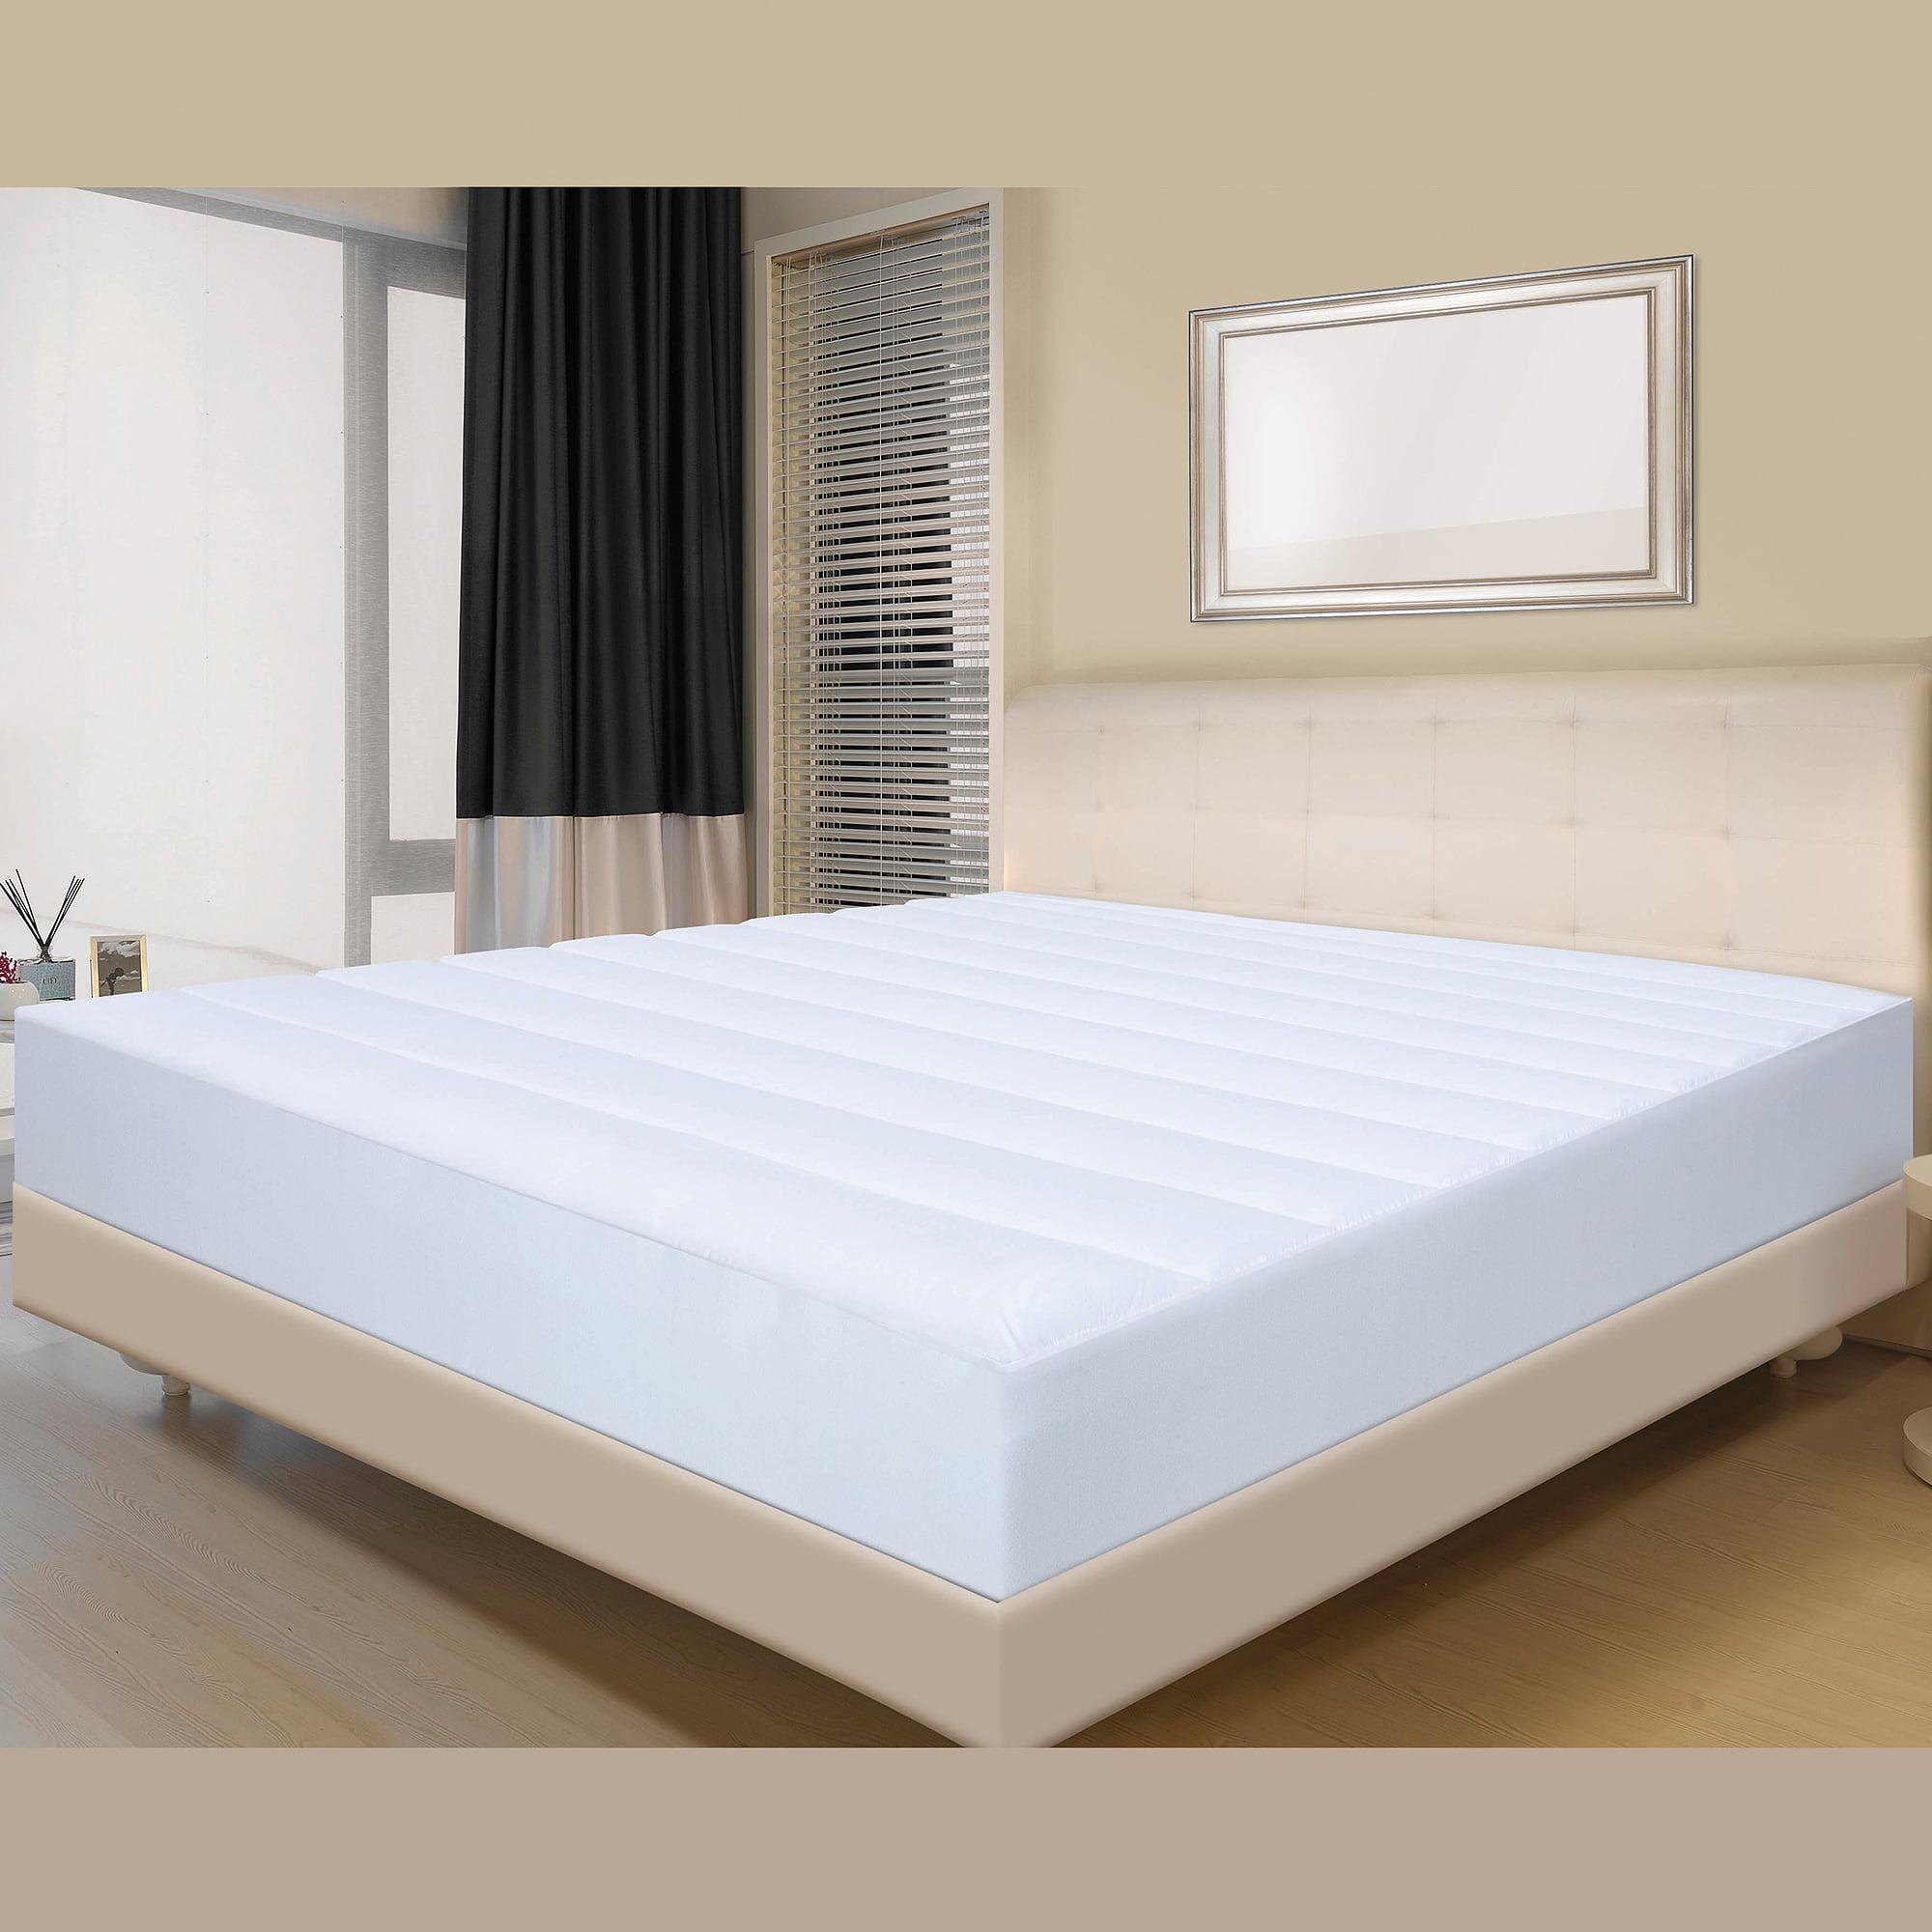 Comfort Co. Sleep Innovations Waterproof Mattress Pad